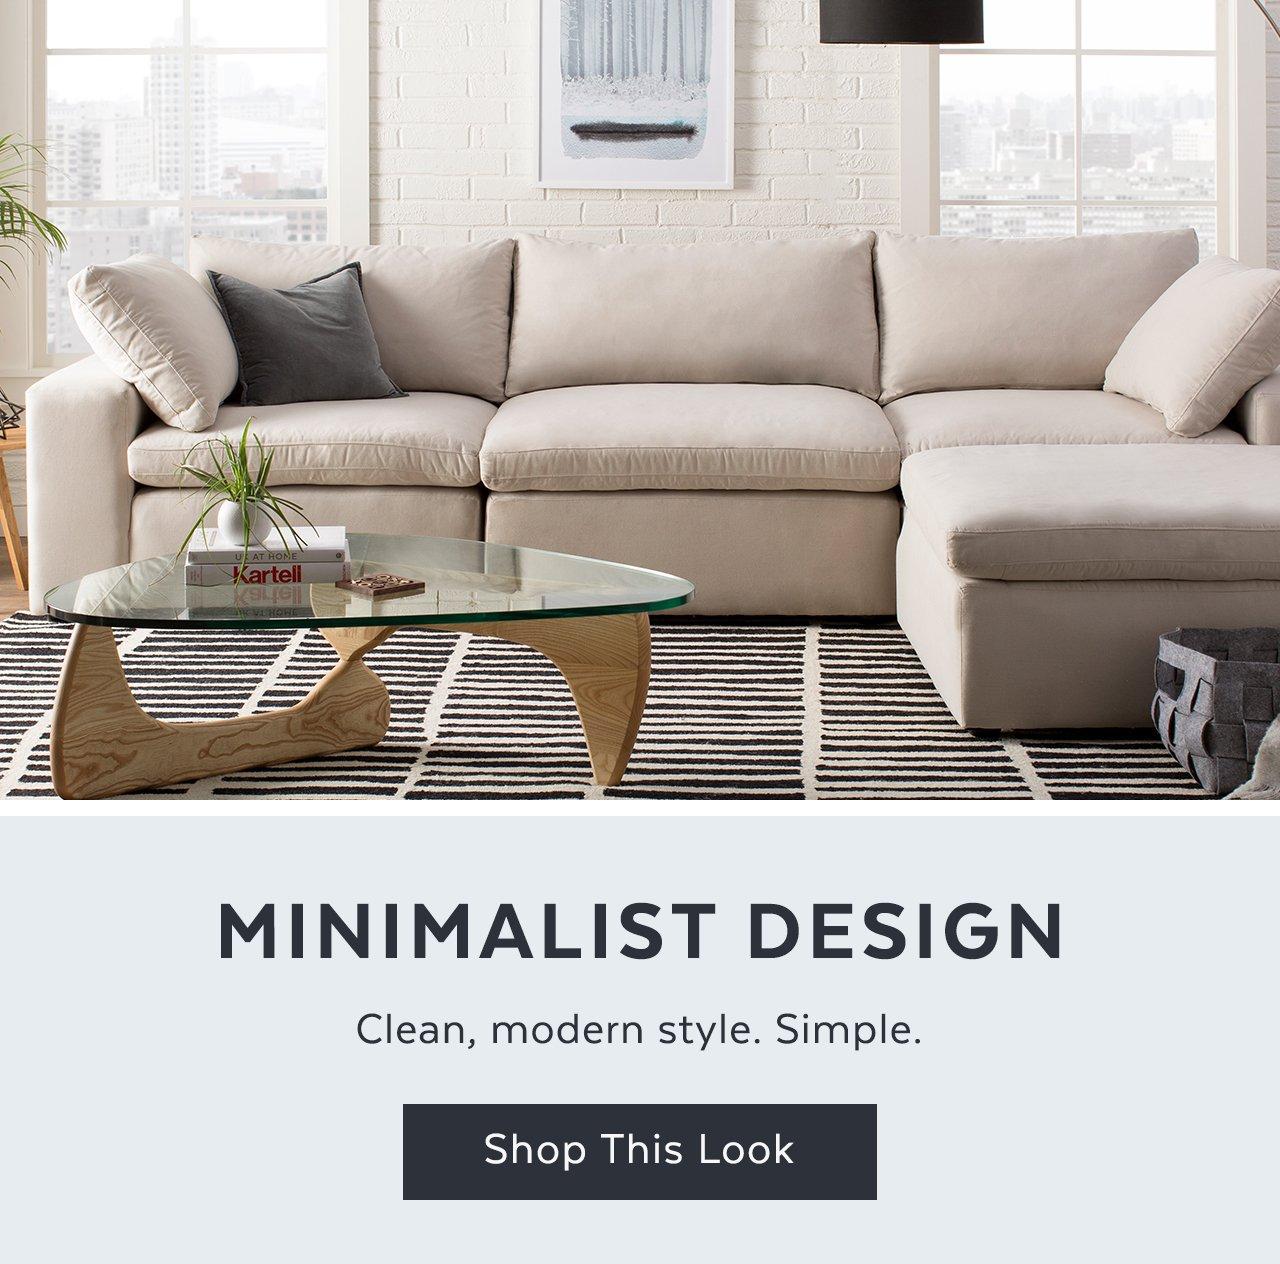 Minimalist Design